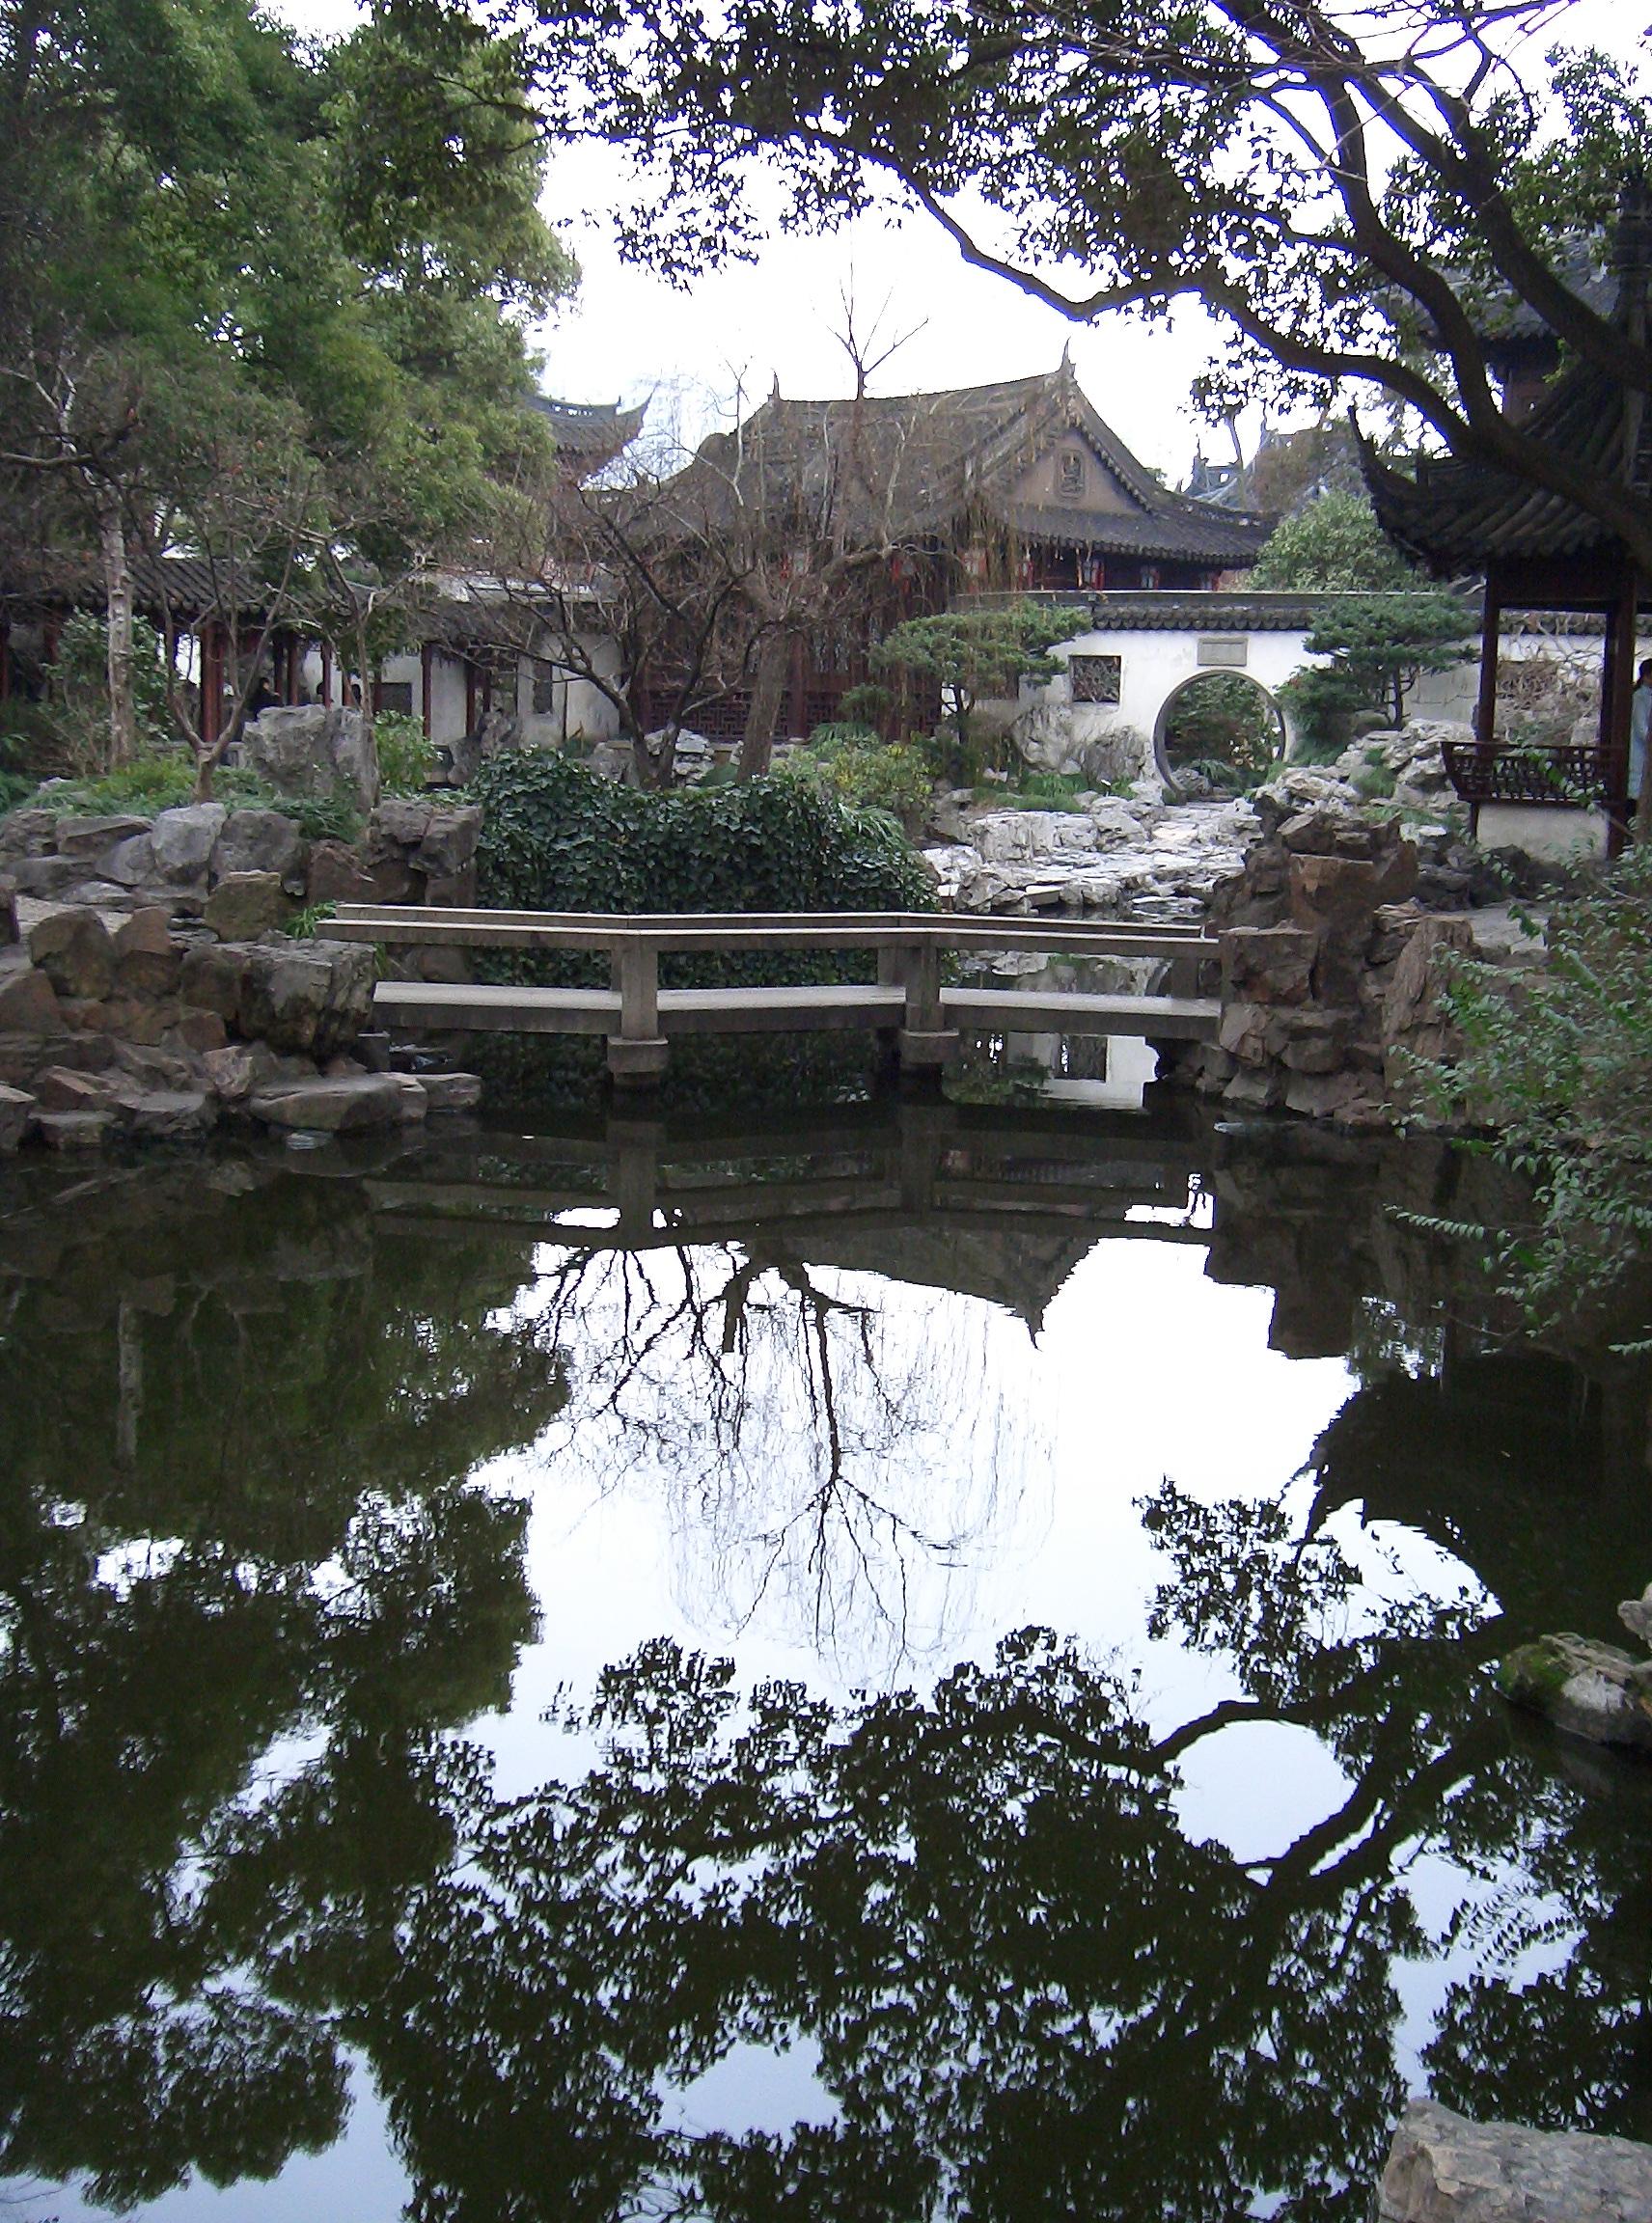 50 elegant photos of yu garden in shanghai places. Black Bedroom Furniture Sets. Home Design Ideas